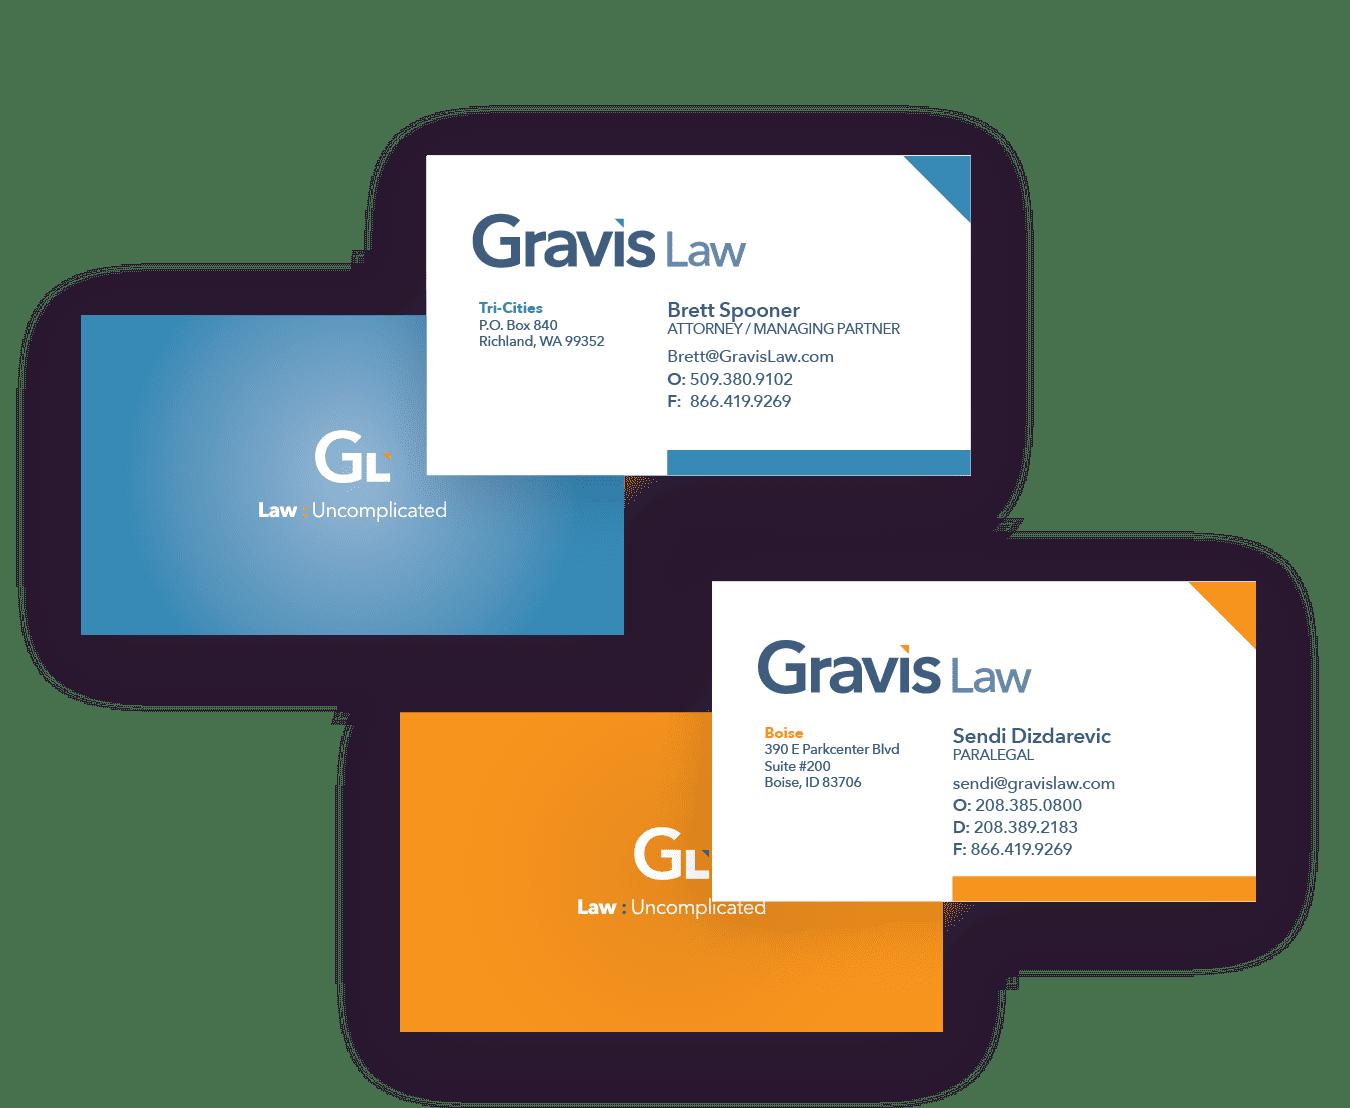 Gravis-portfolio-business cards-02-02